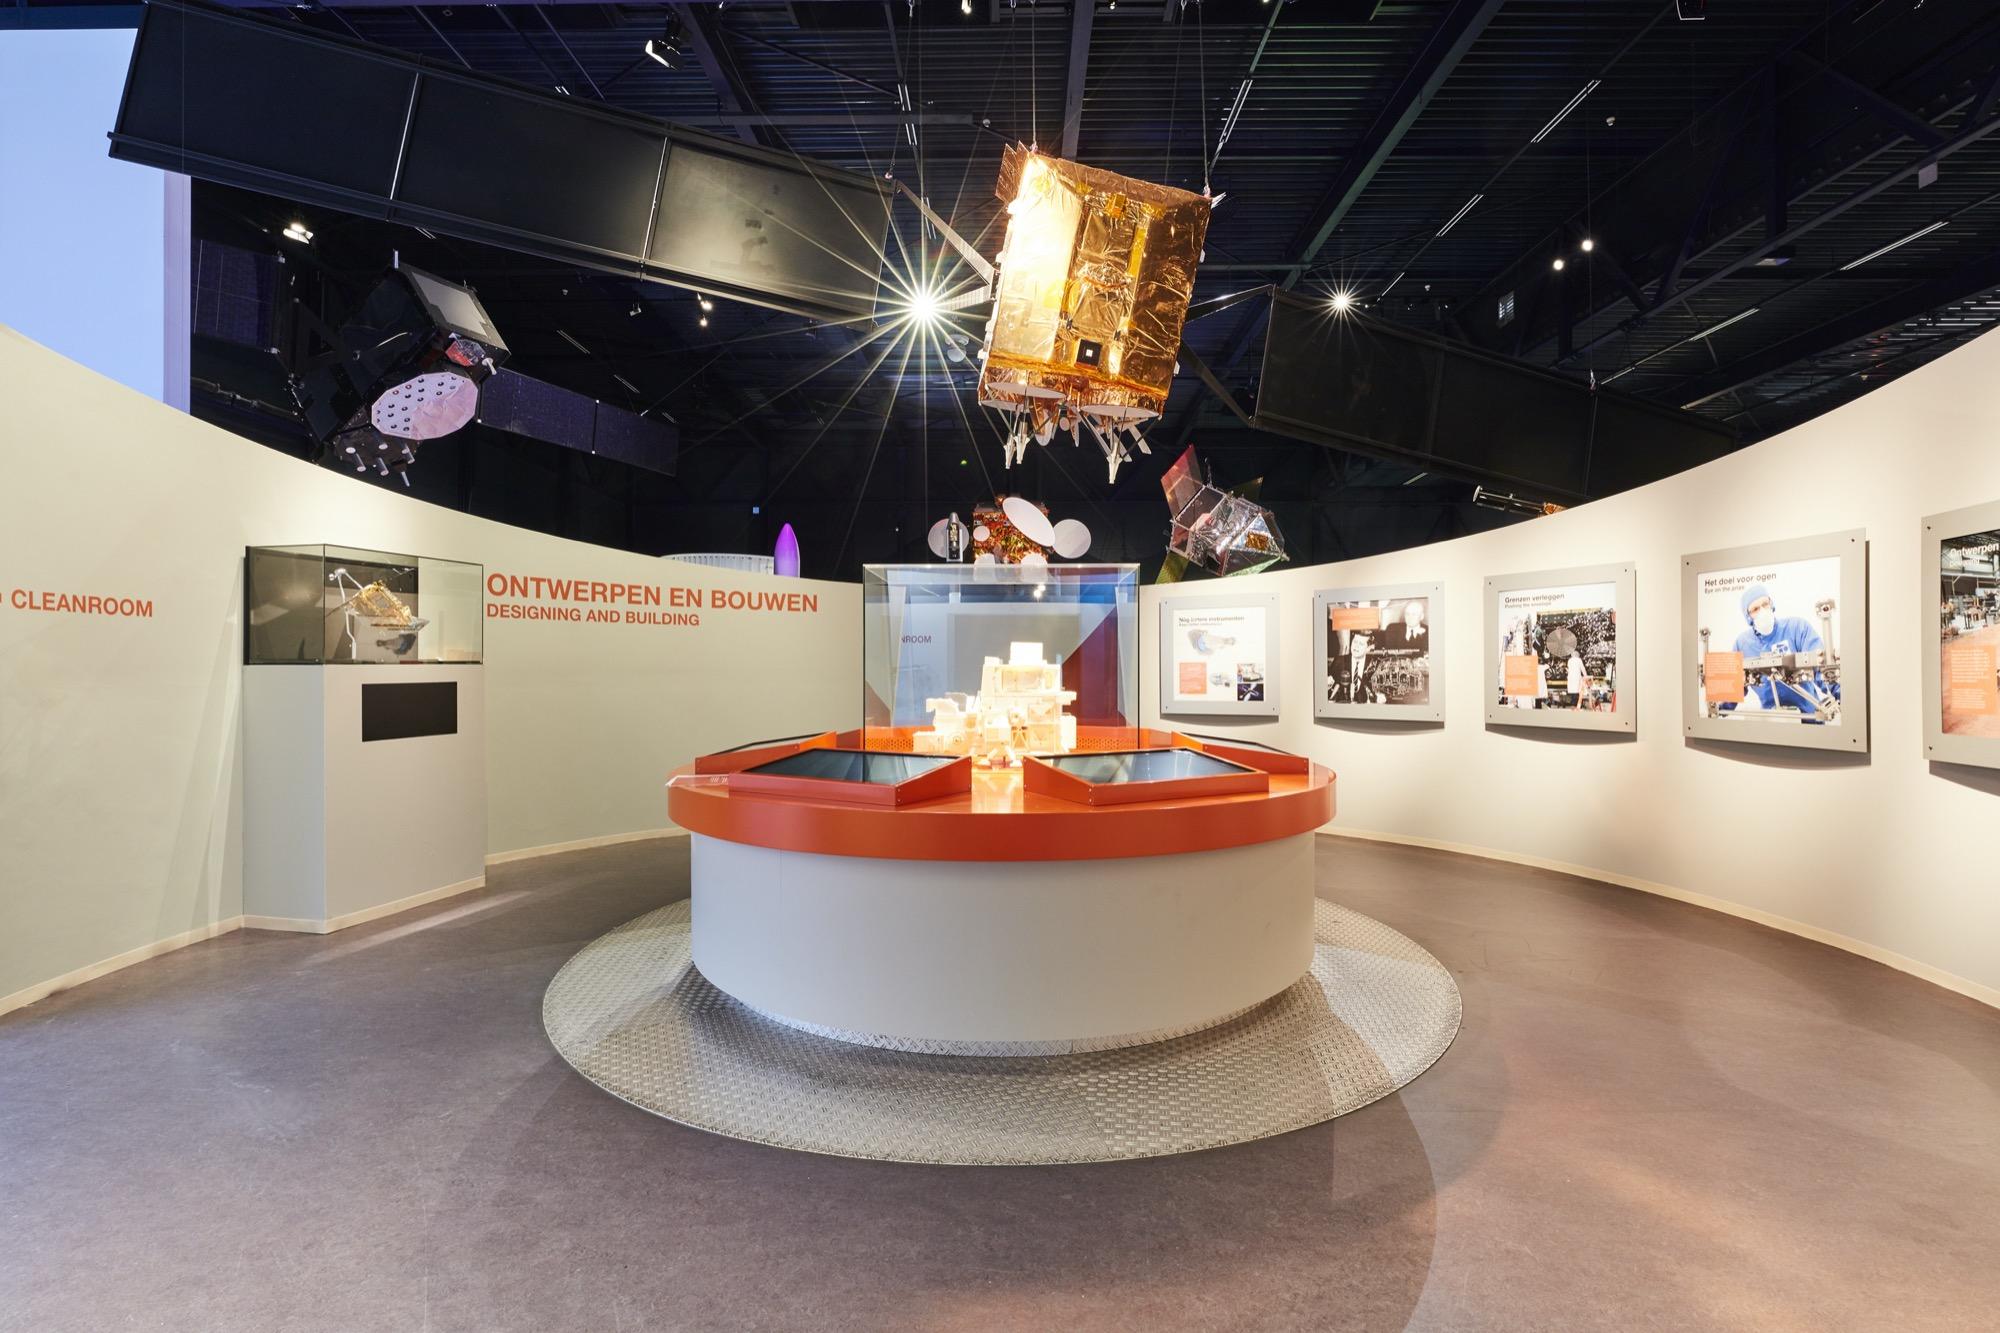 Vernieuwing ruimtevaartmuseum Space Expo